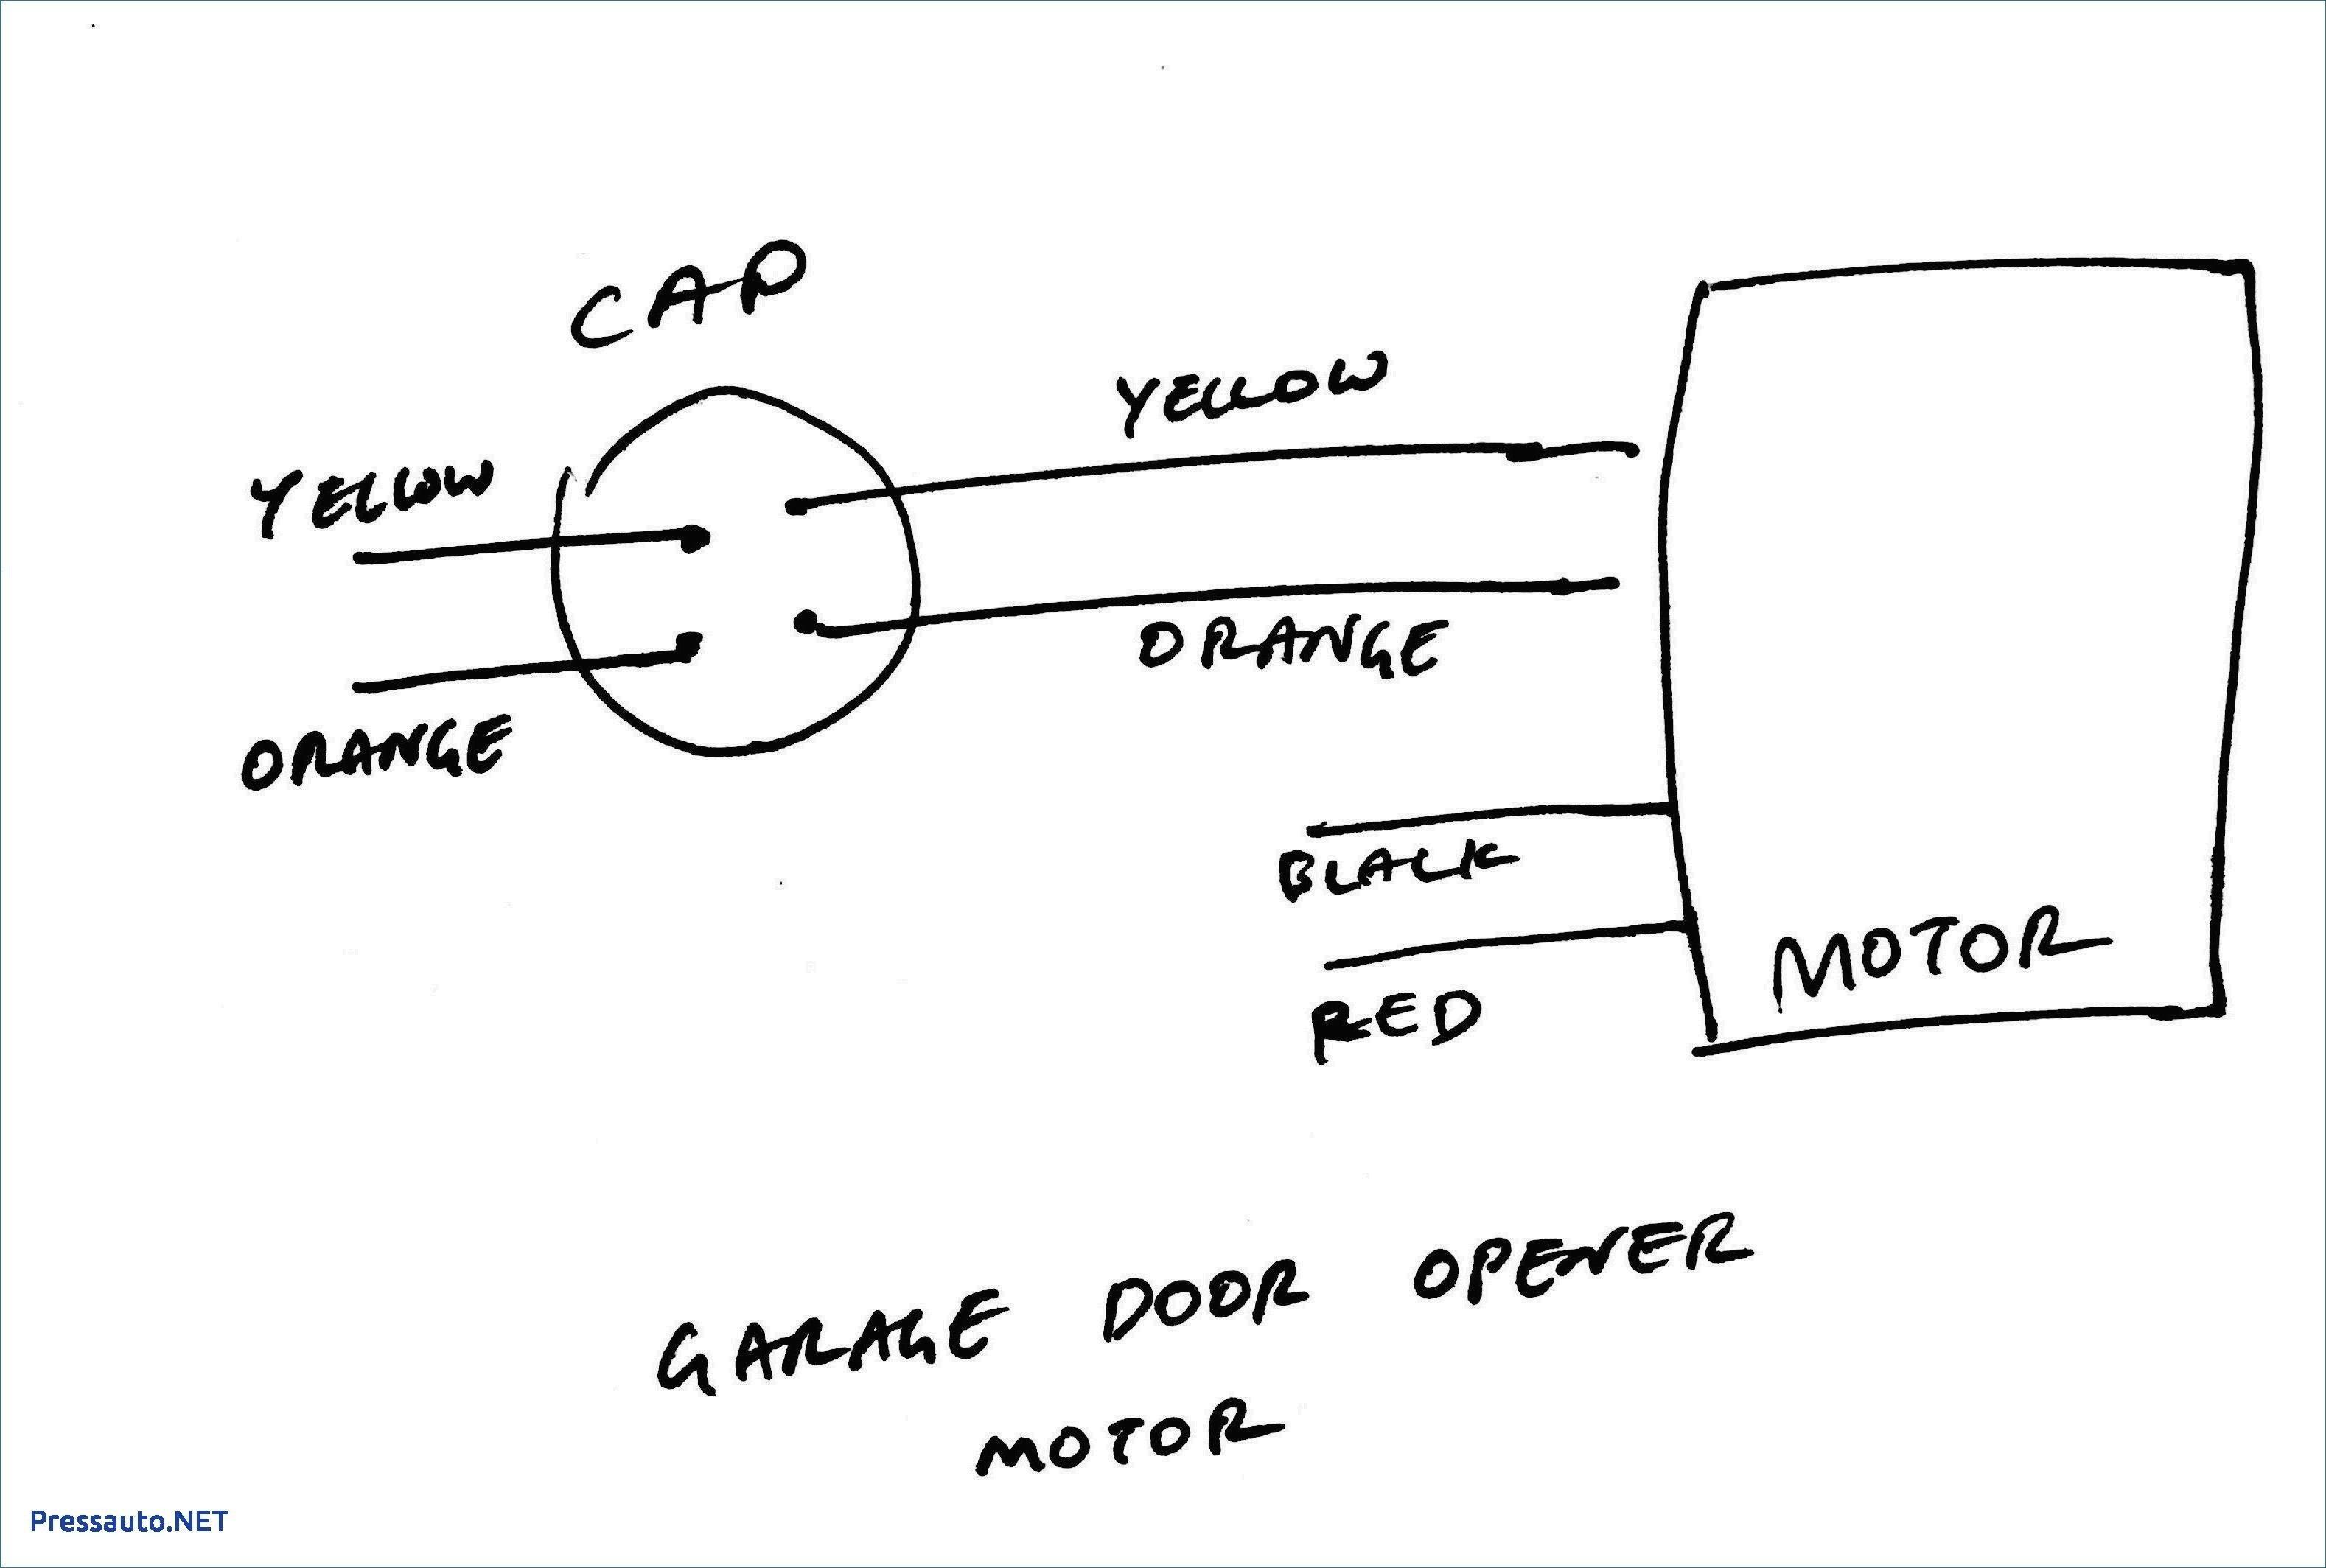 New Electric Motor Wiring Basics Diagram Wiringdiagram Diagramming Diagramm Visuals Visualisation Graphical Diagram Diagram Chart Electrical Diagram